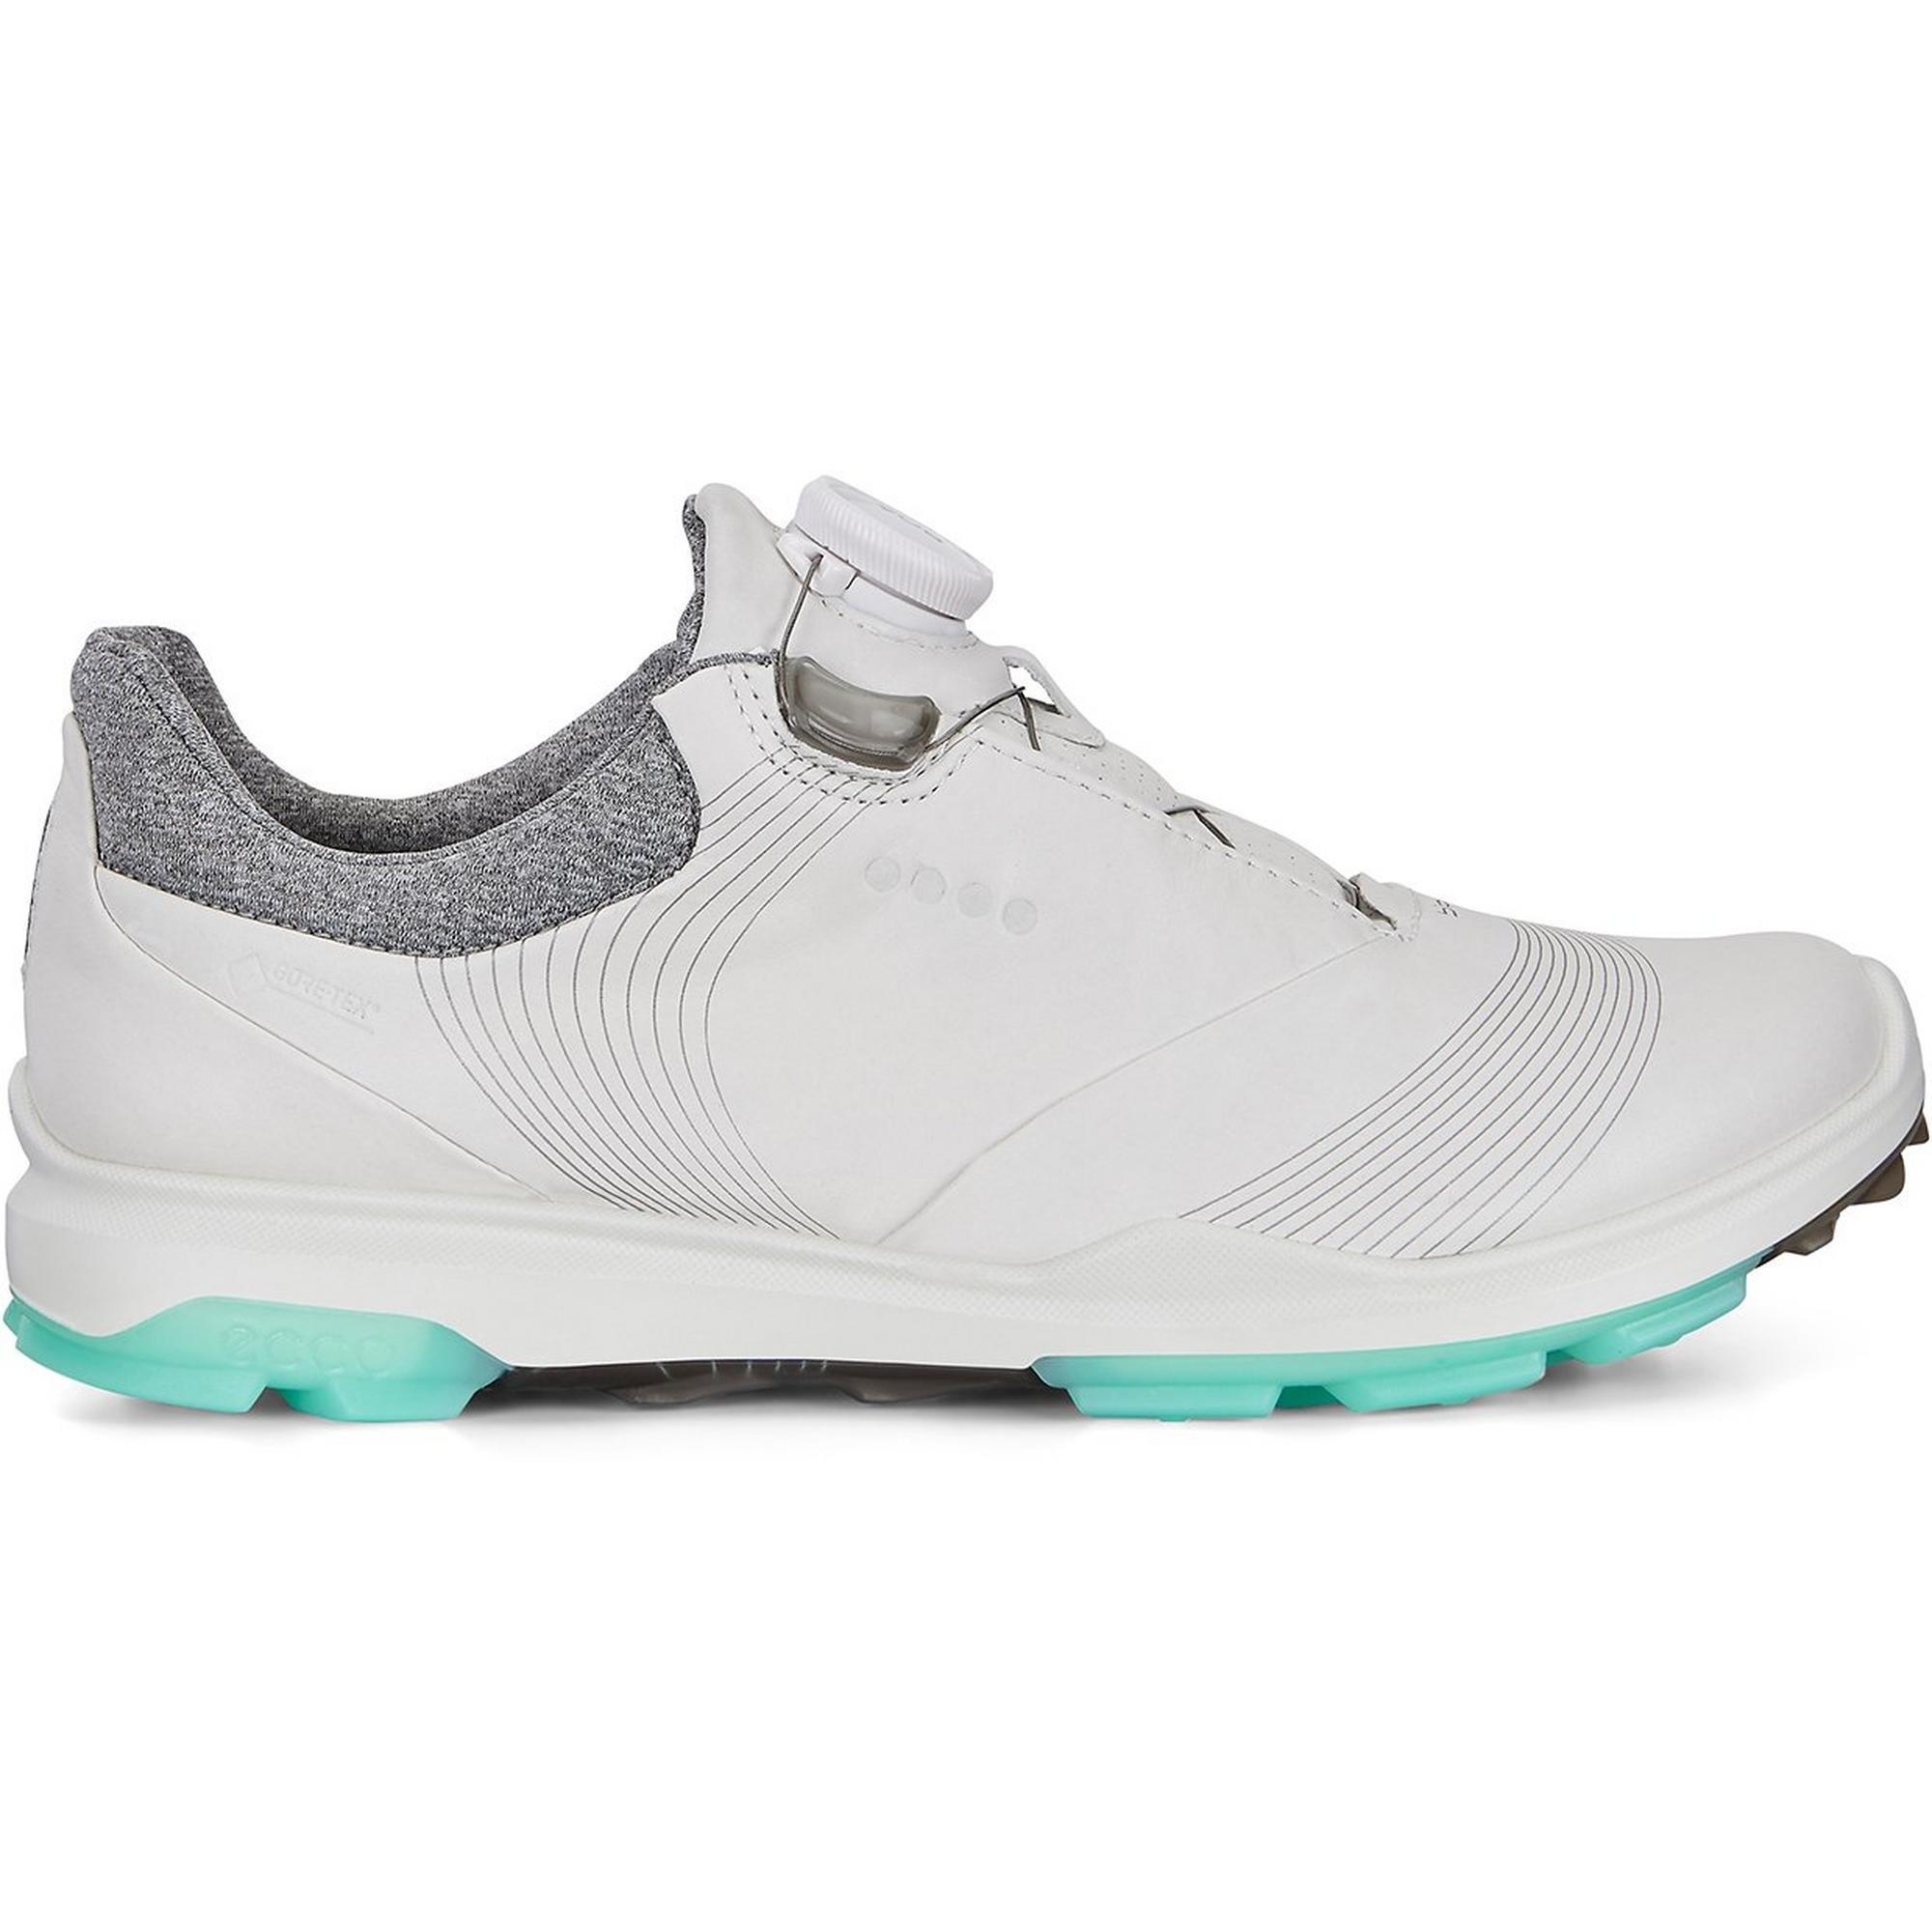 Womens Goretex Biom Hybrid 3 Boa Spikeless Golf Shoe  - WHT/GRN